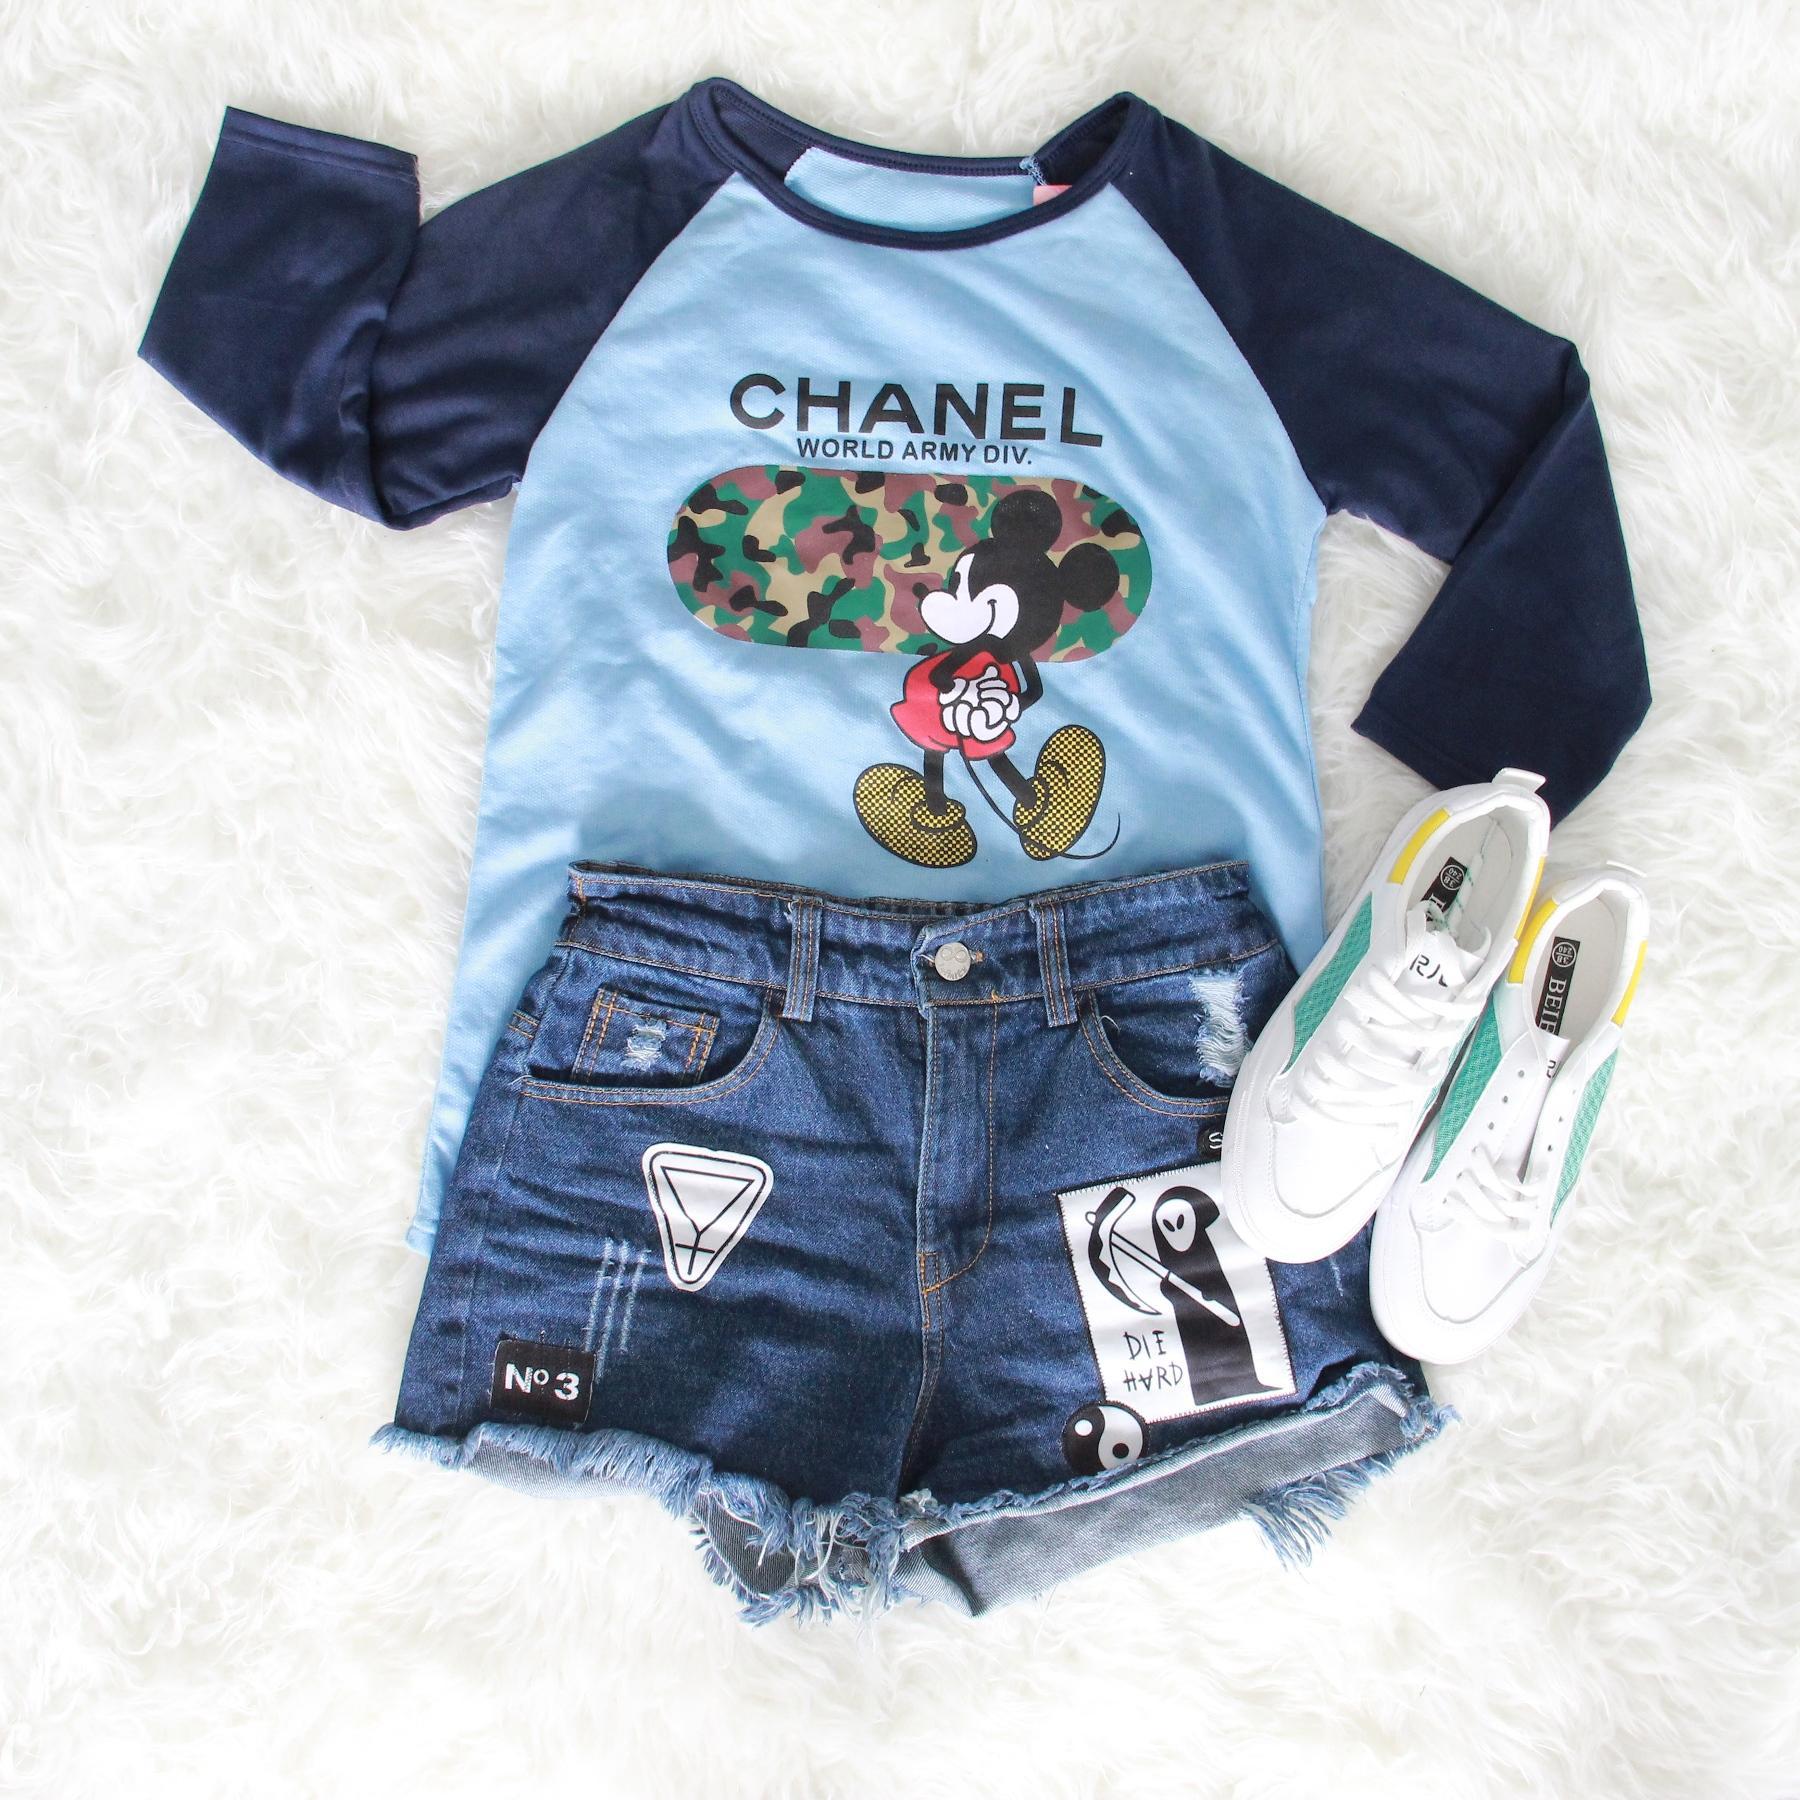 JCLOTHES Kaos Raglan Wanita / T-Shirt Raglan Blouse Lengan Panjang Mickey Channel